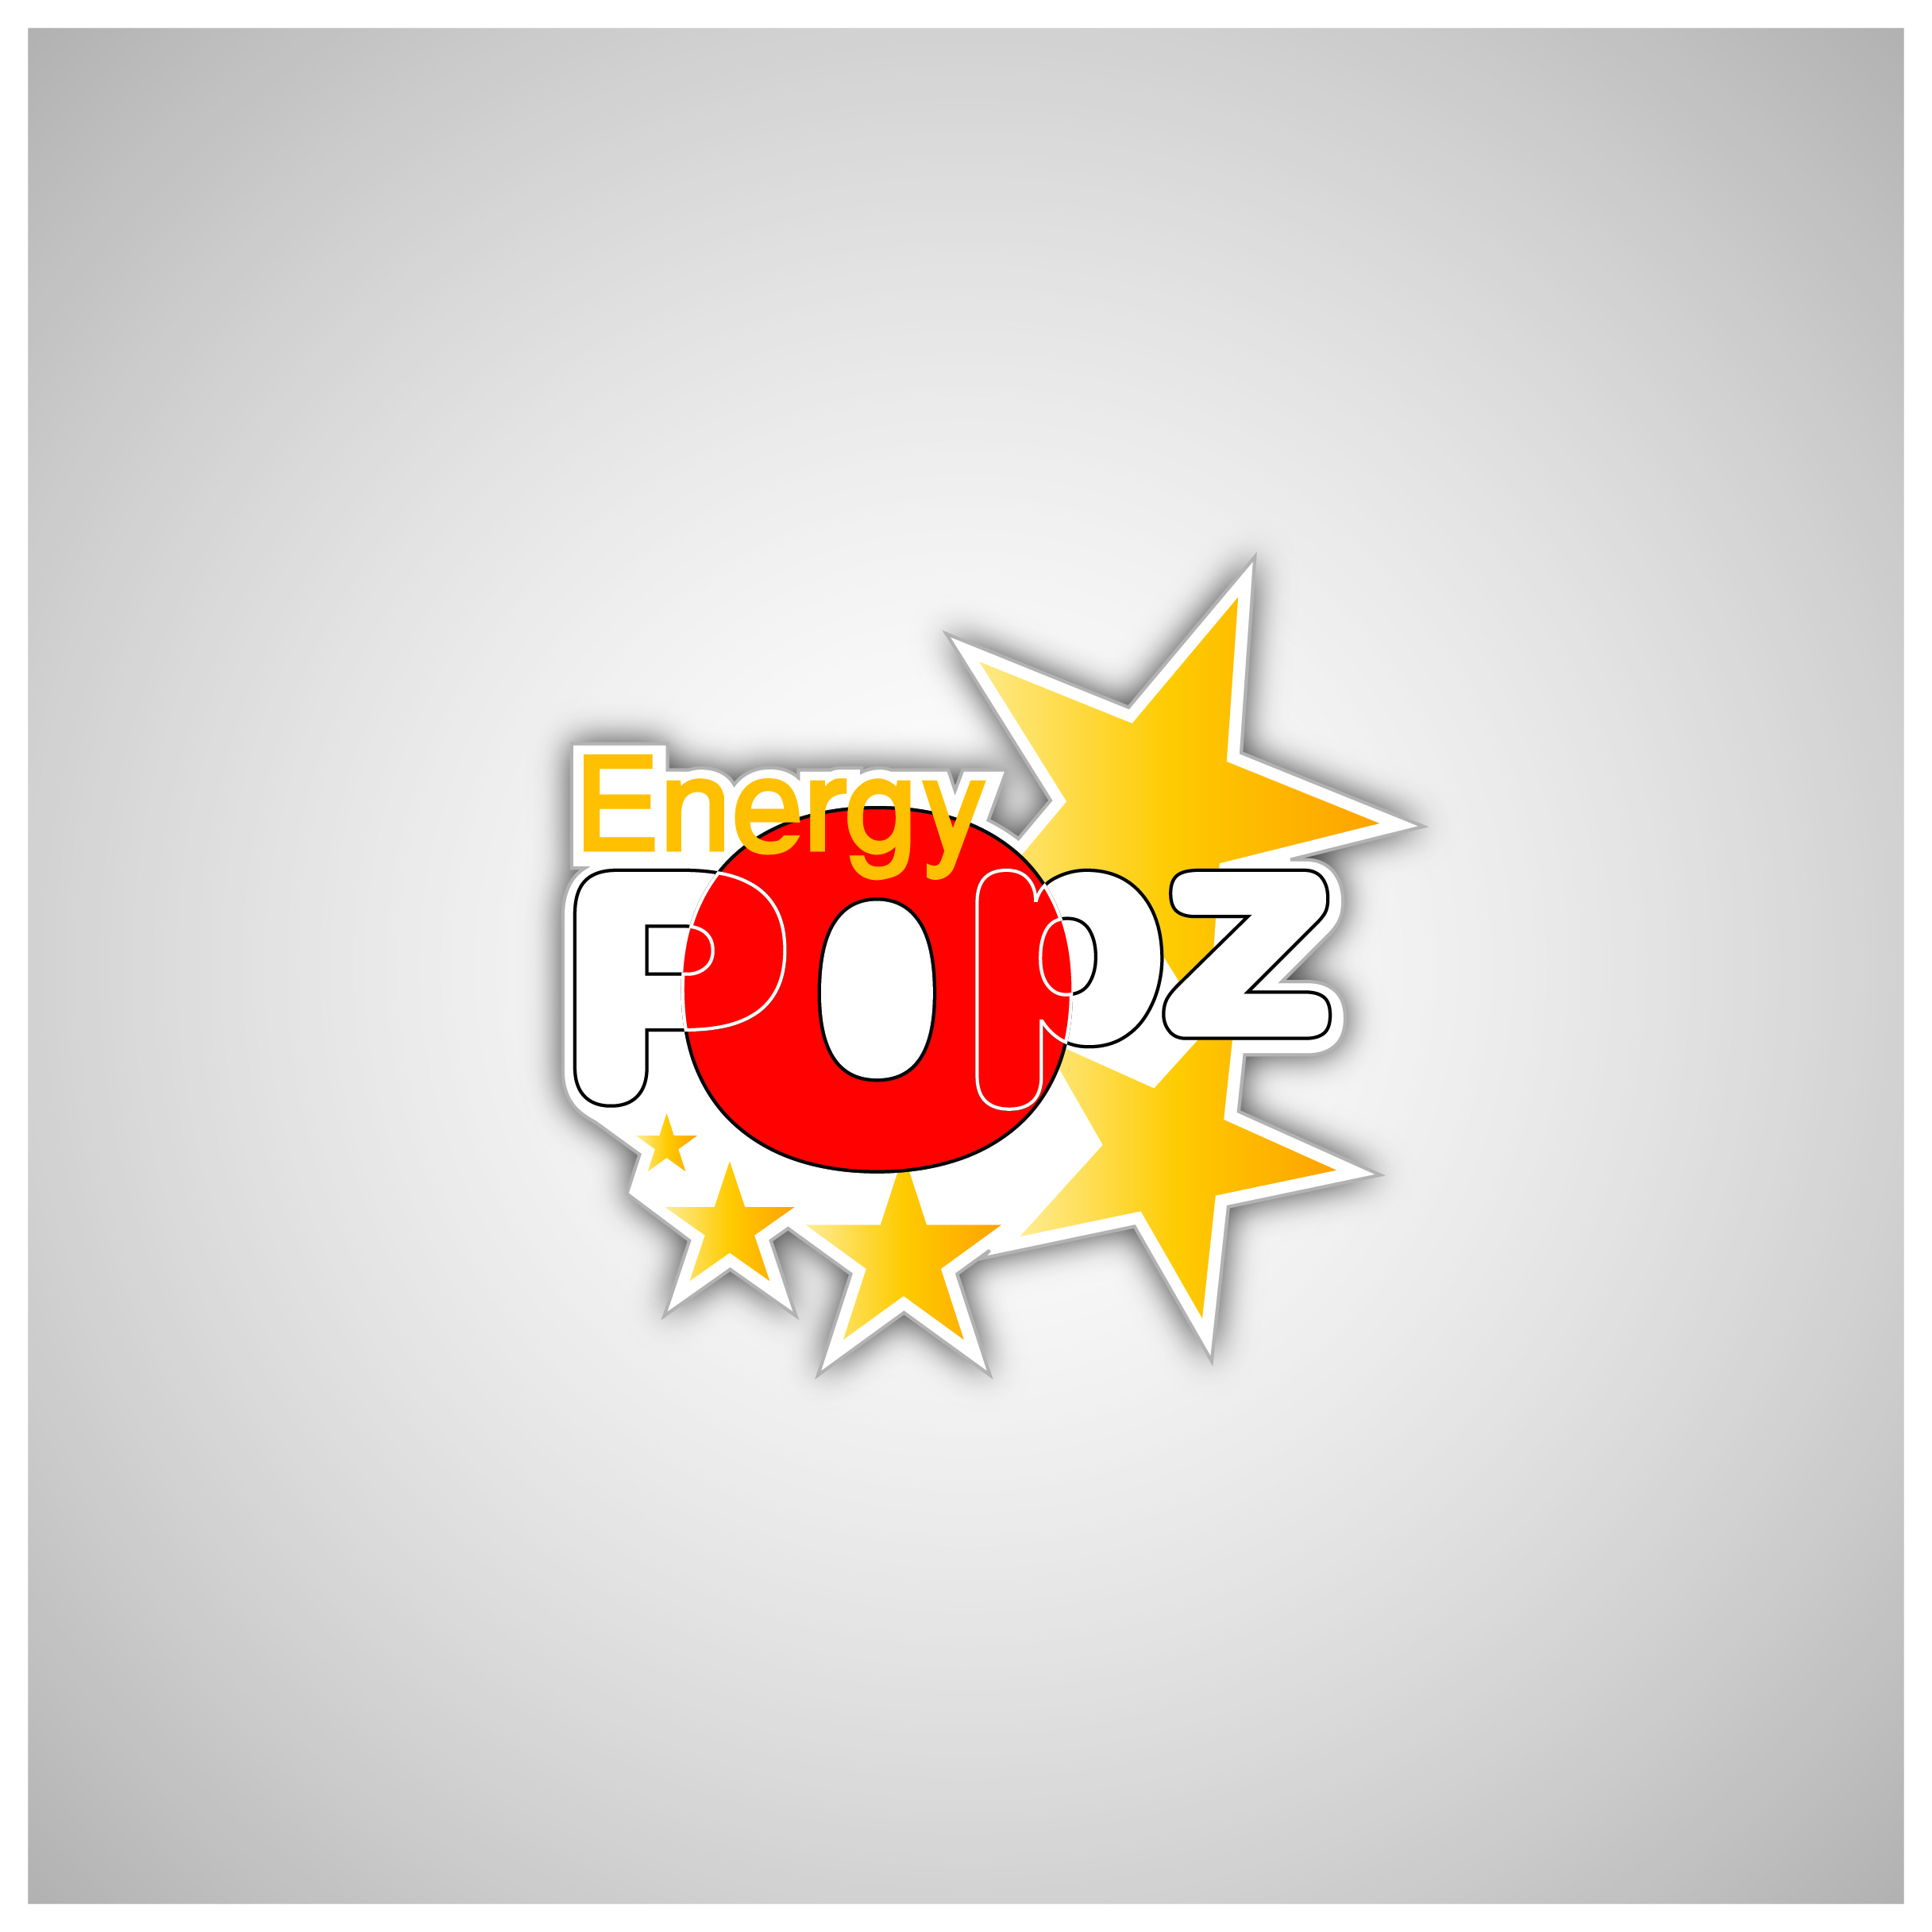 Logo Design by Sampath Gunathilaka - Entry No. 6 in the Logo Design Contest Energy Popz Logo Design.